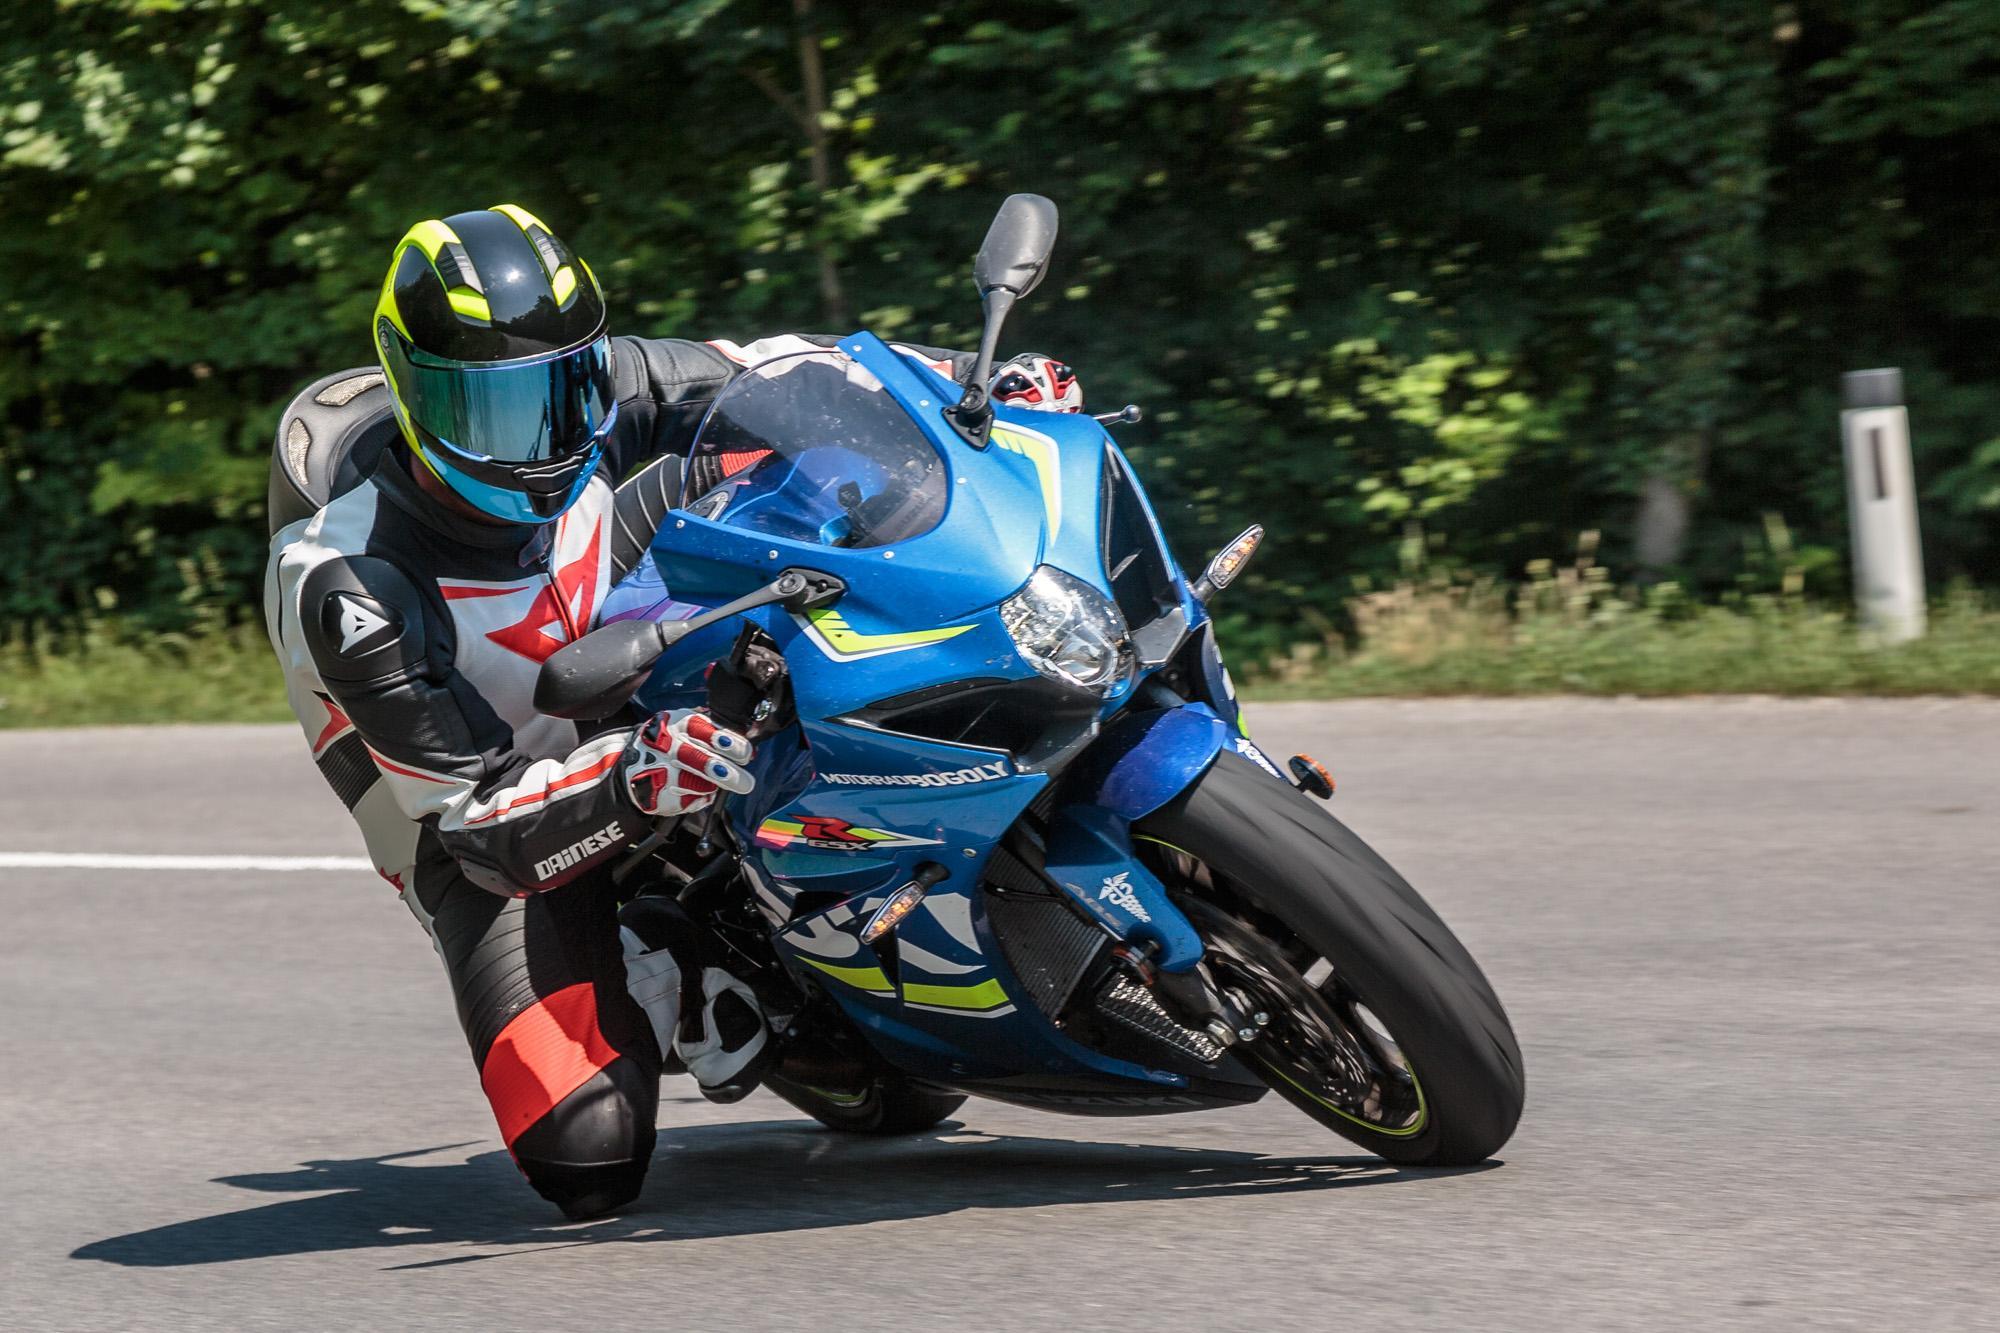 Тест-драйв мотоцикла Suzuki GSX-R1100